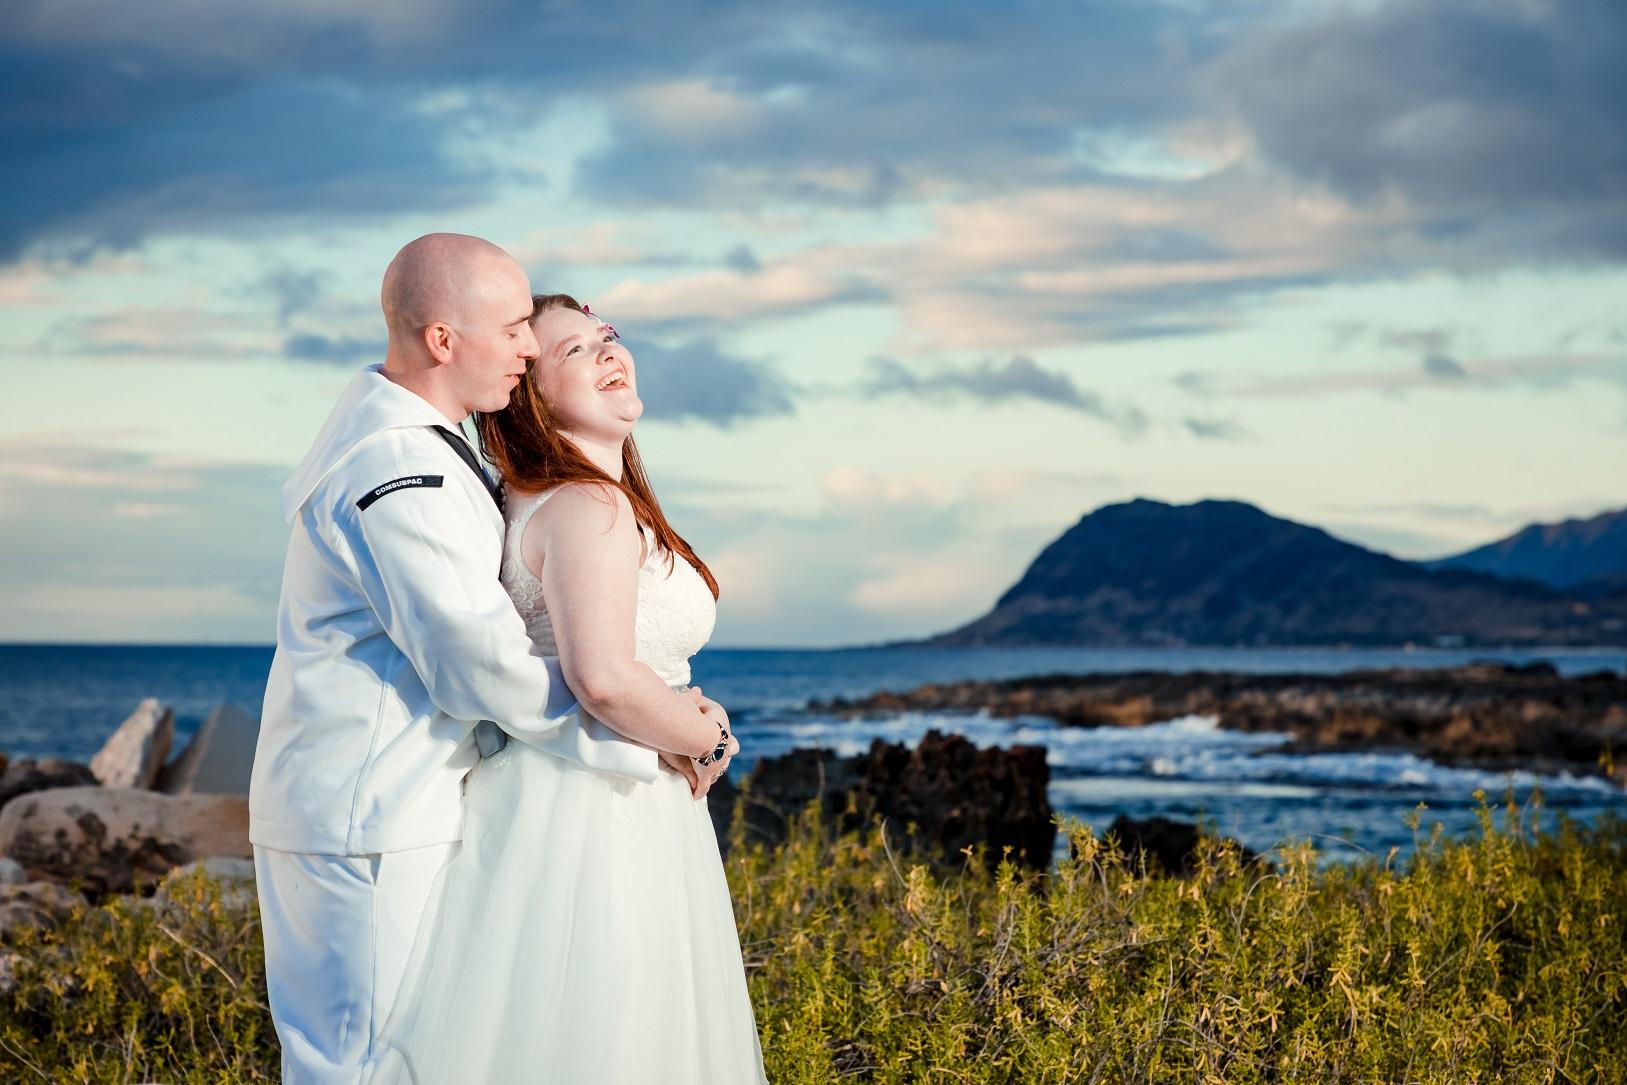 oahu bride and groom beach wedding portrait photos